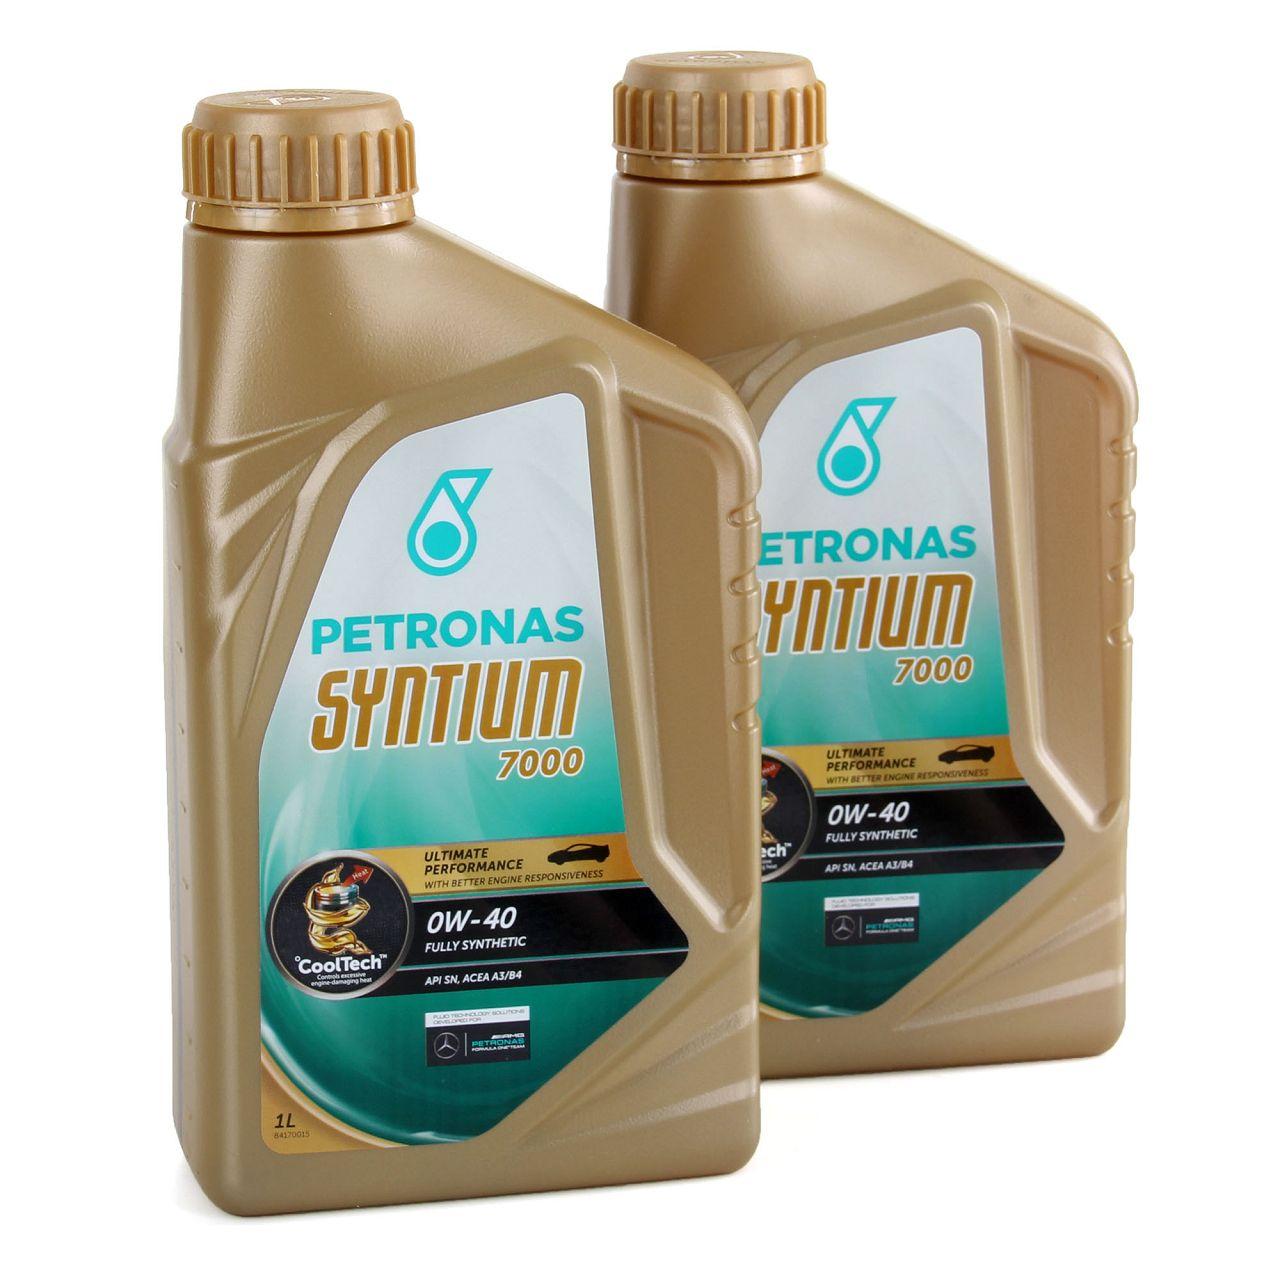 2L PETRONAS Syntium 7000 Motoröl Öl 0W40 ACEA A3/B4 API SN - 2 Liter